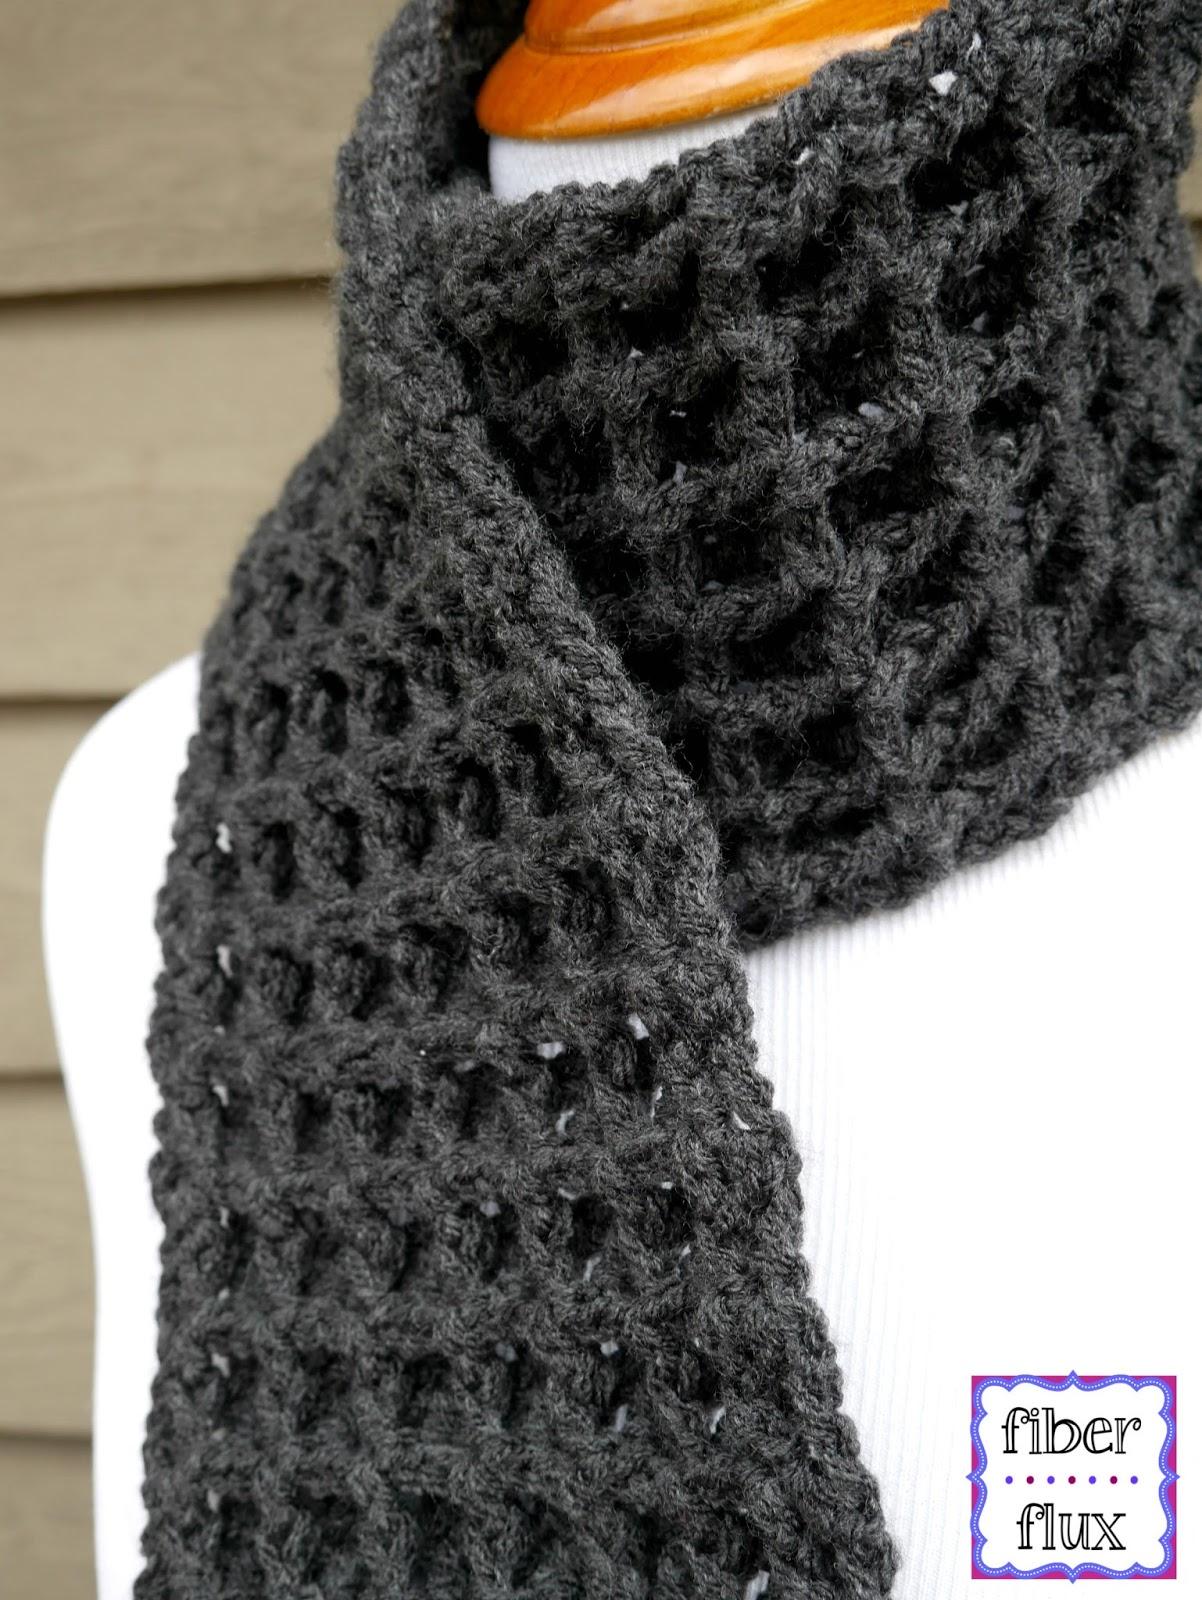 Fiber Flux Free Crochet Patternwaffle Stitch Crochet Scarf